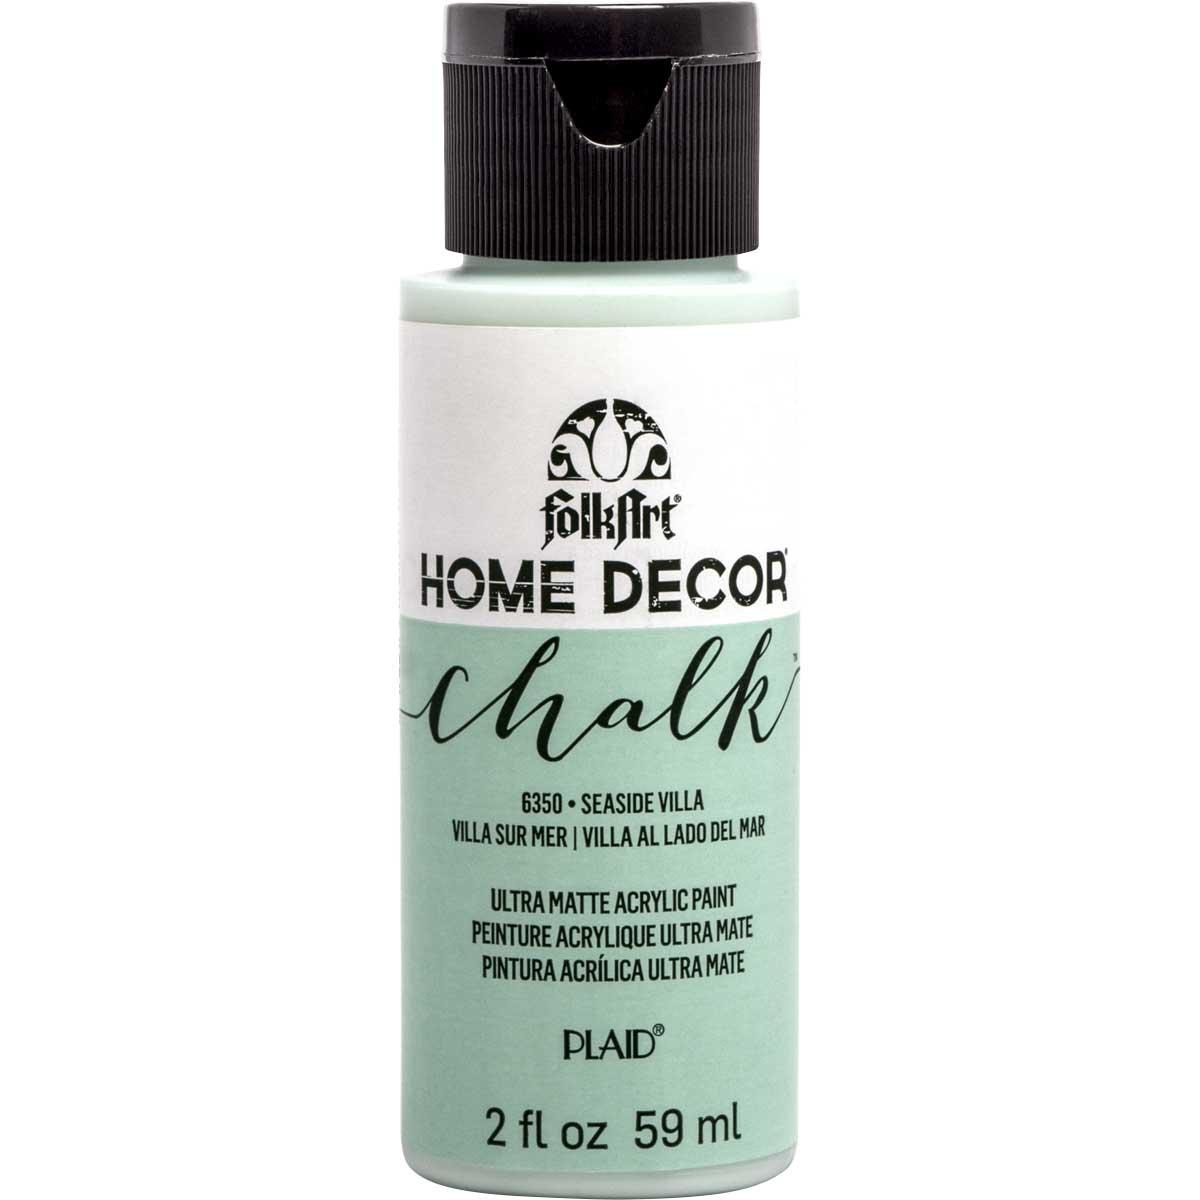 FolkArt ® Home Decor™ Chalk - Seaside Villa, 2 oz. - 6350